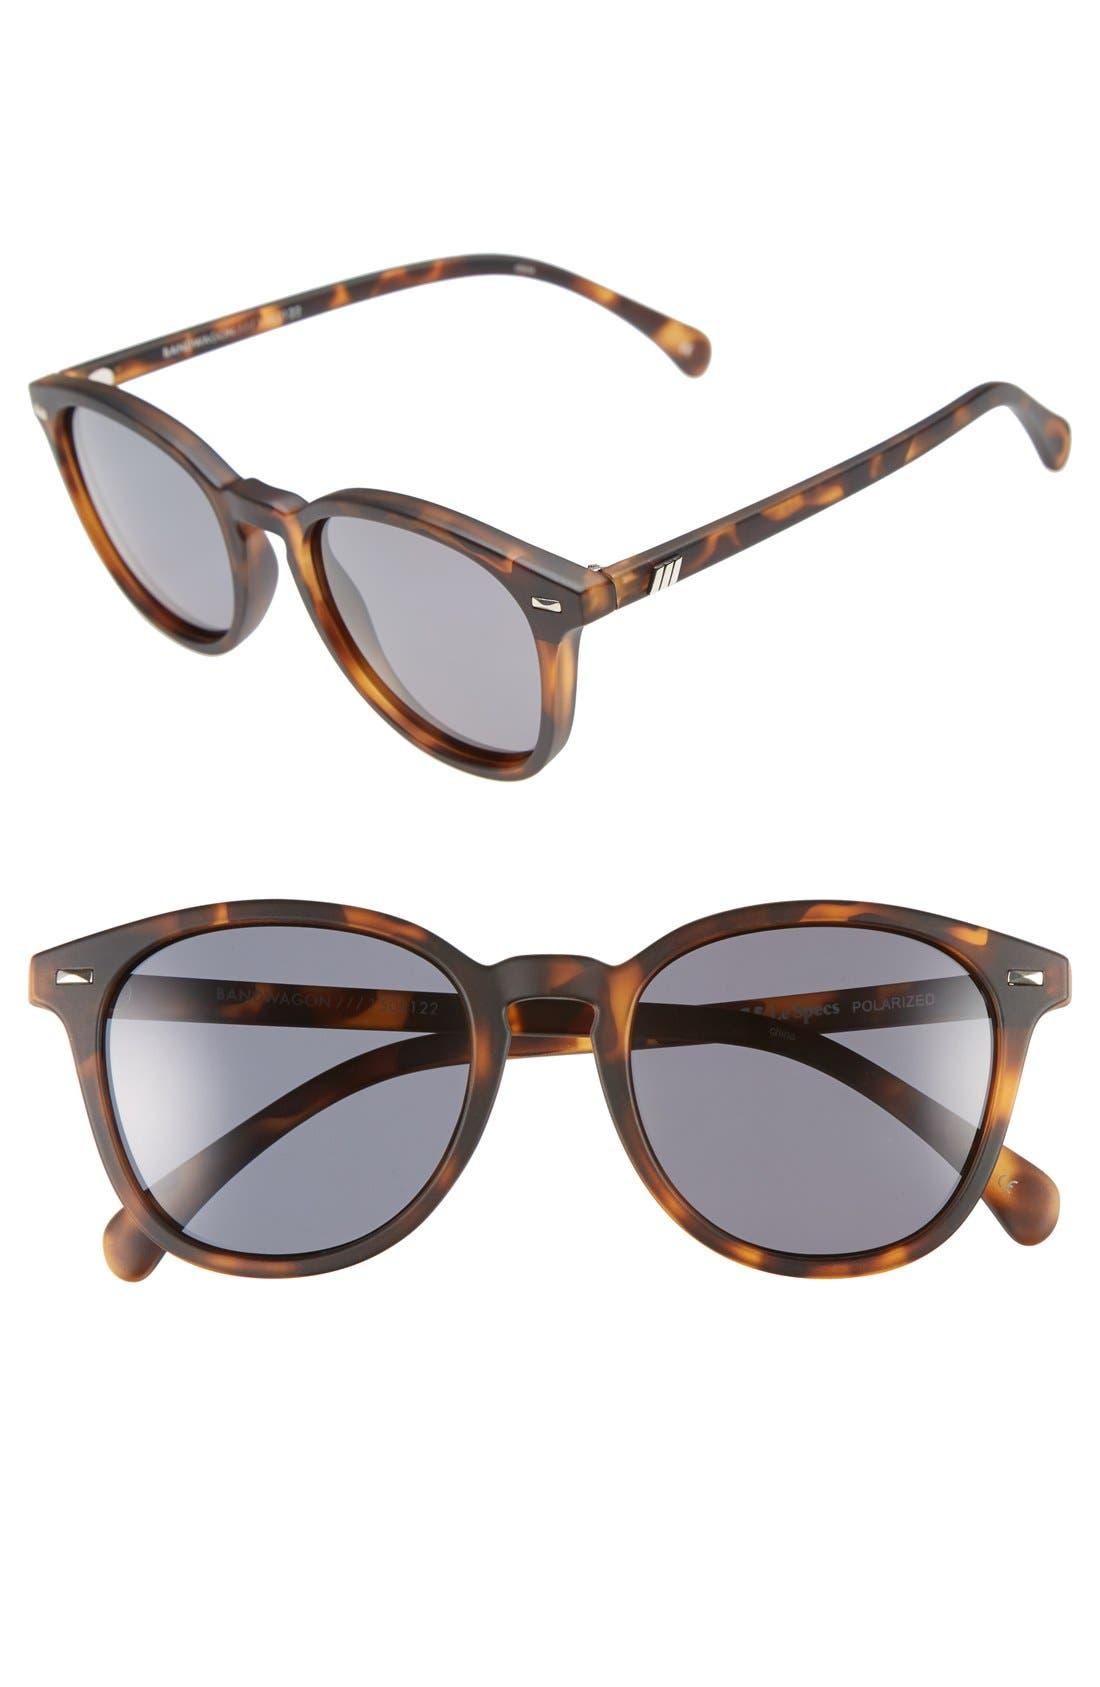 Alternate Image 1 Selected - Le Specs 'Bandwagon' 51mm Polarized Sunglasses